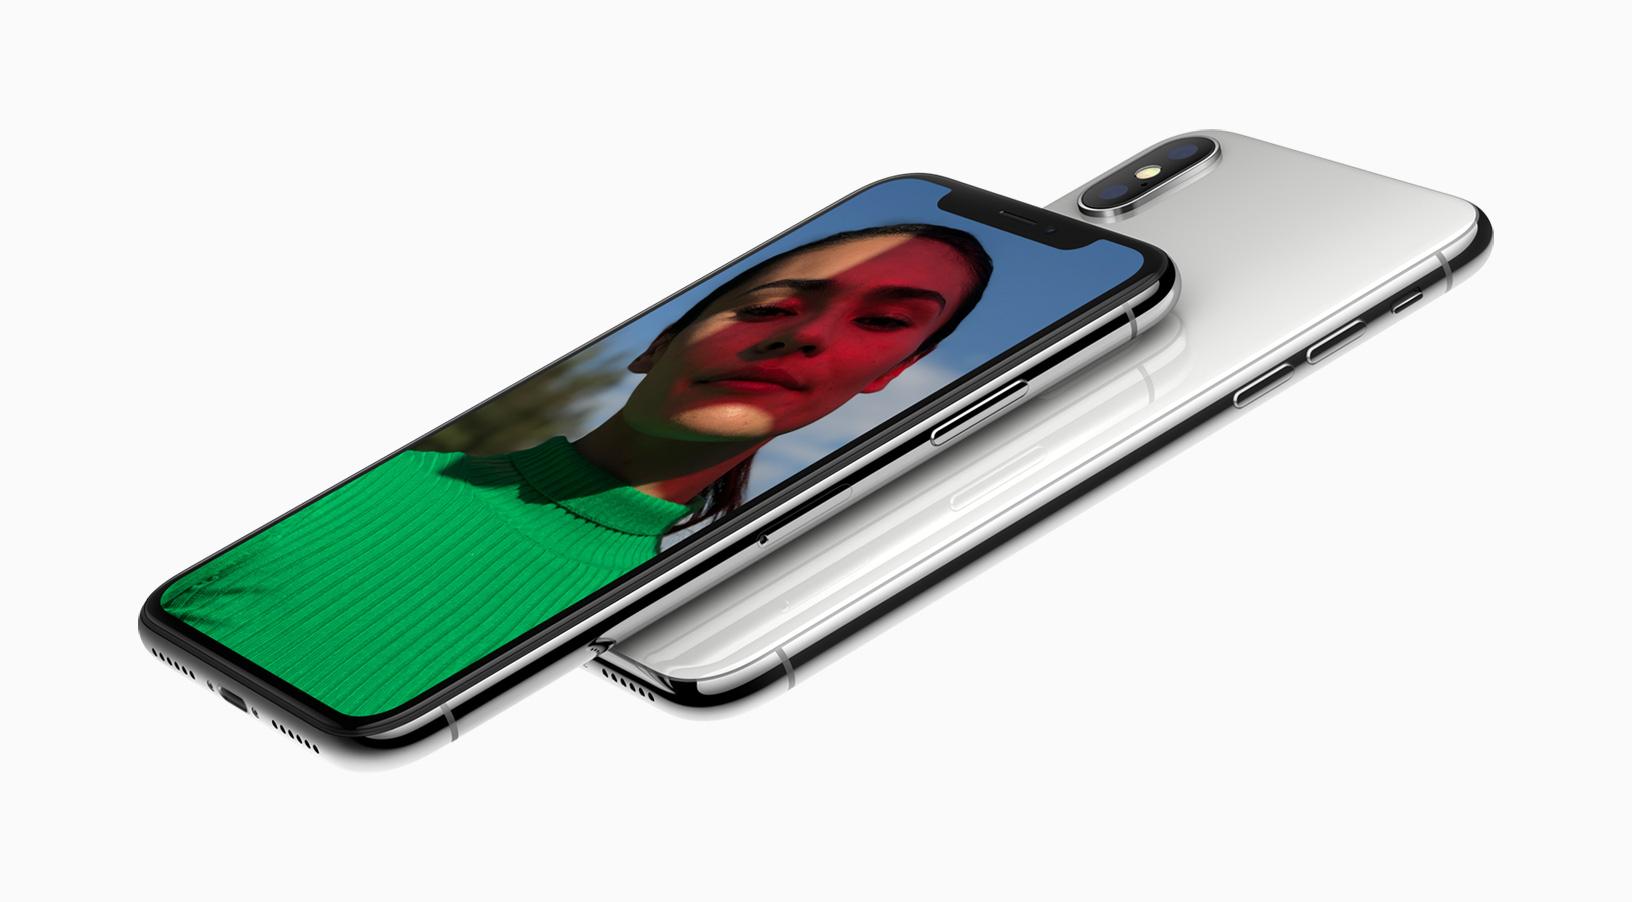 iPhone X, 리뷰어들의 평가는?